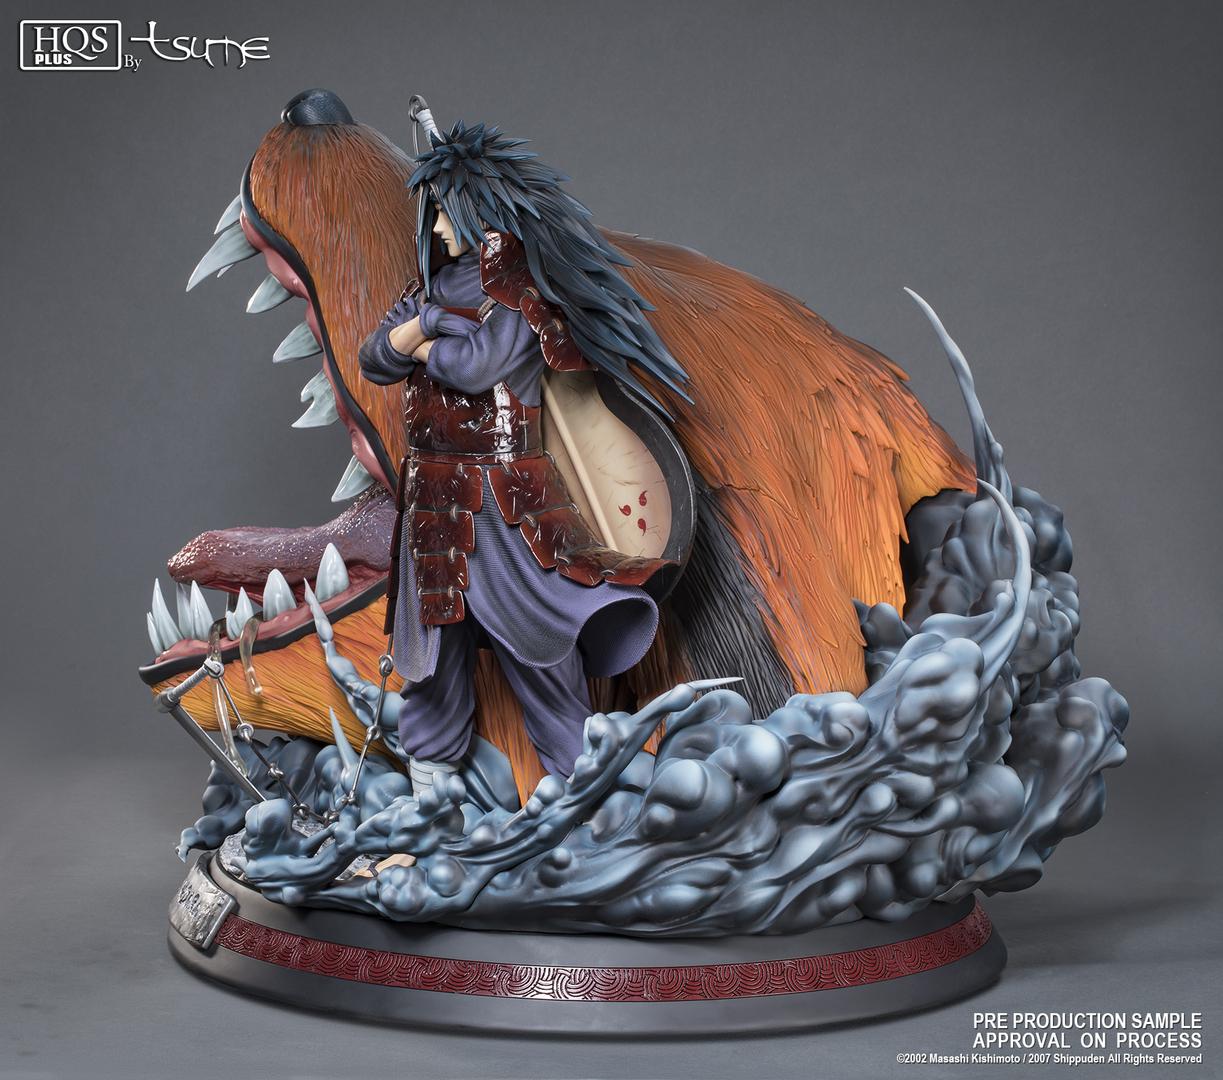 Statue Naruto Shippuden Madara Uchiha HQS+ by Tsume 1001 Figurines 7